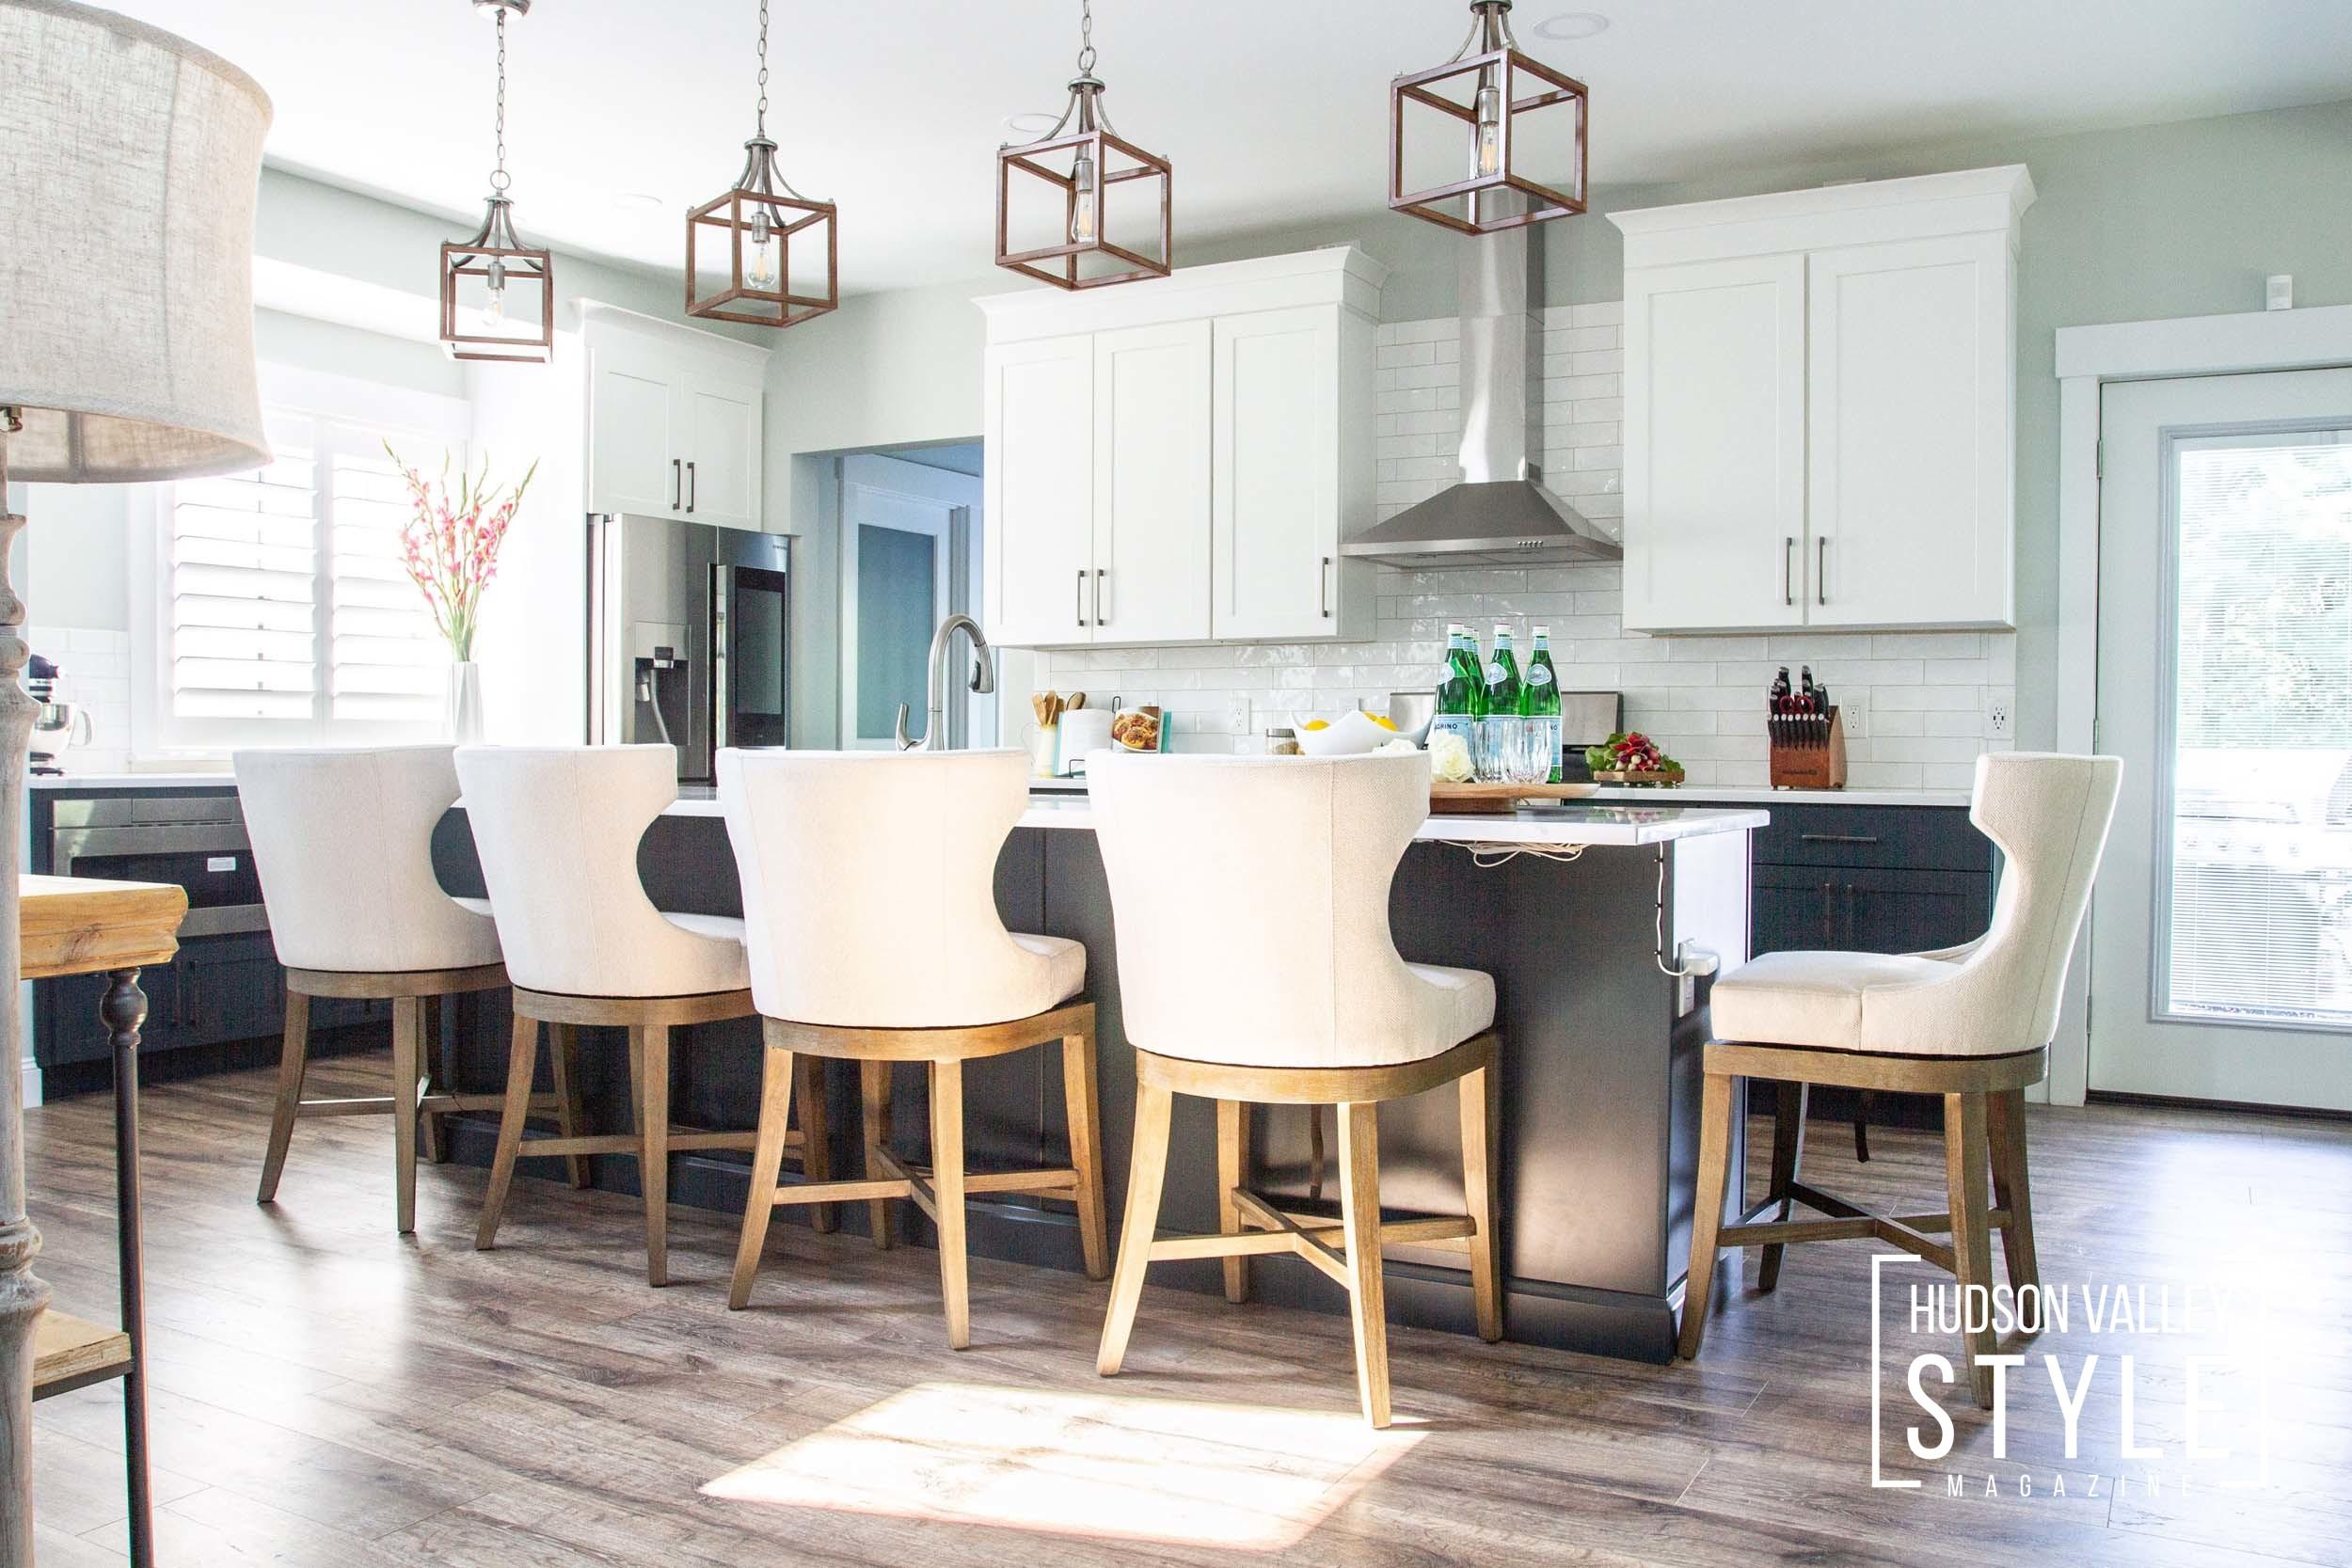 Modern Hudson Valley Farmhouse Interior Design Project by Jennifer Lynn